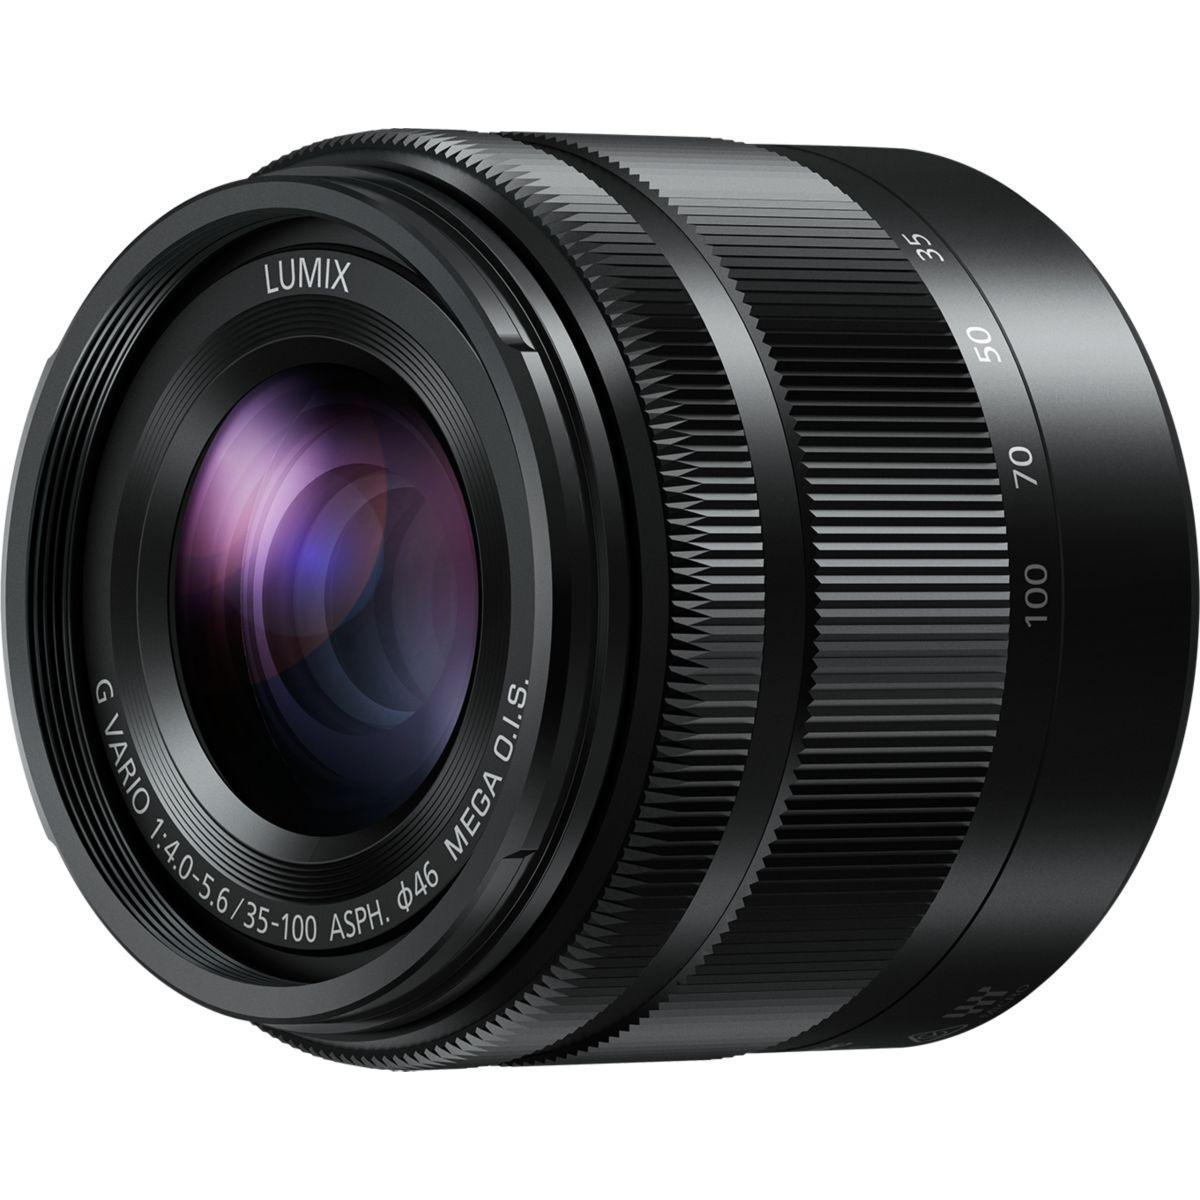 Objectif panasonic 45-150mm f/4.0-5.6 asph. - livraison offerte : code liv